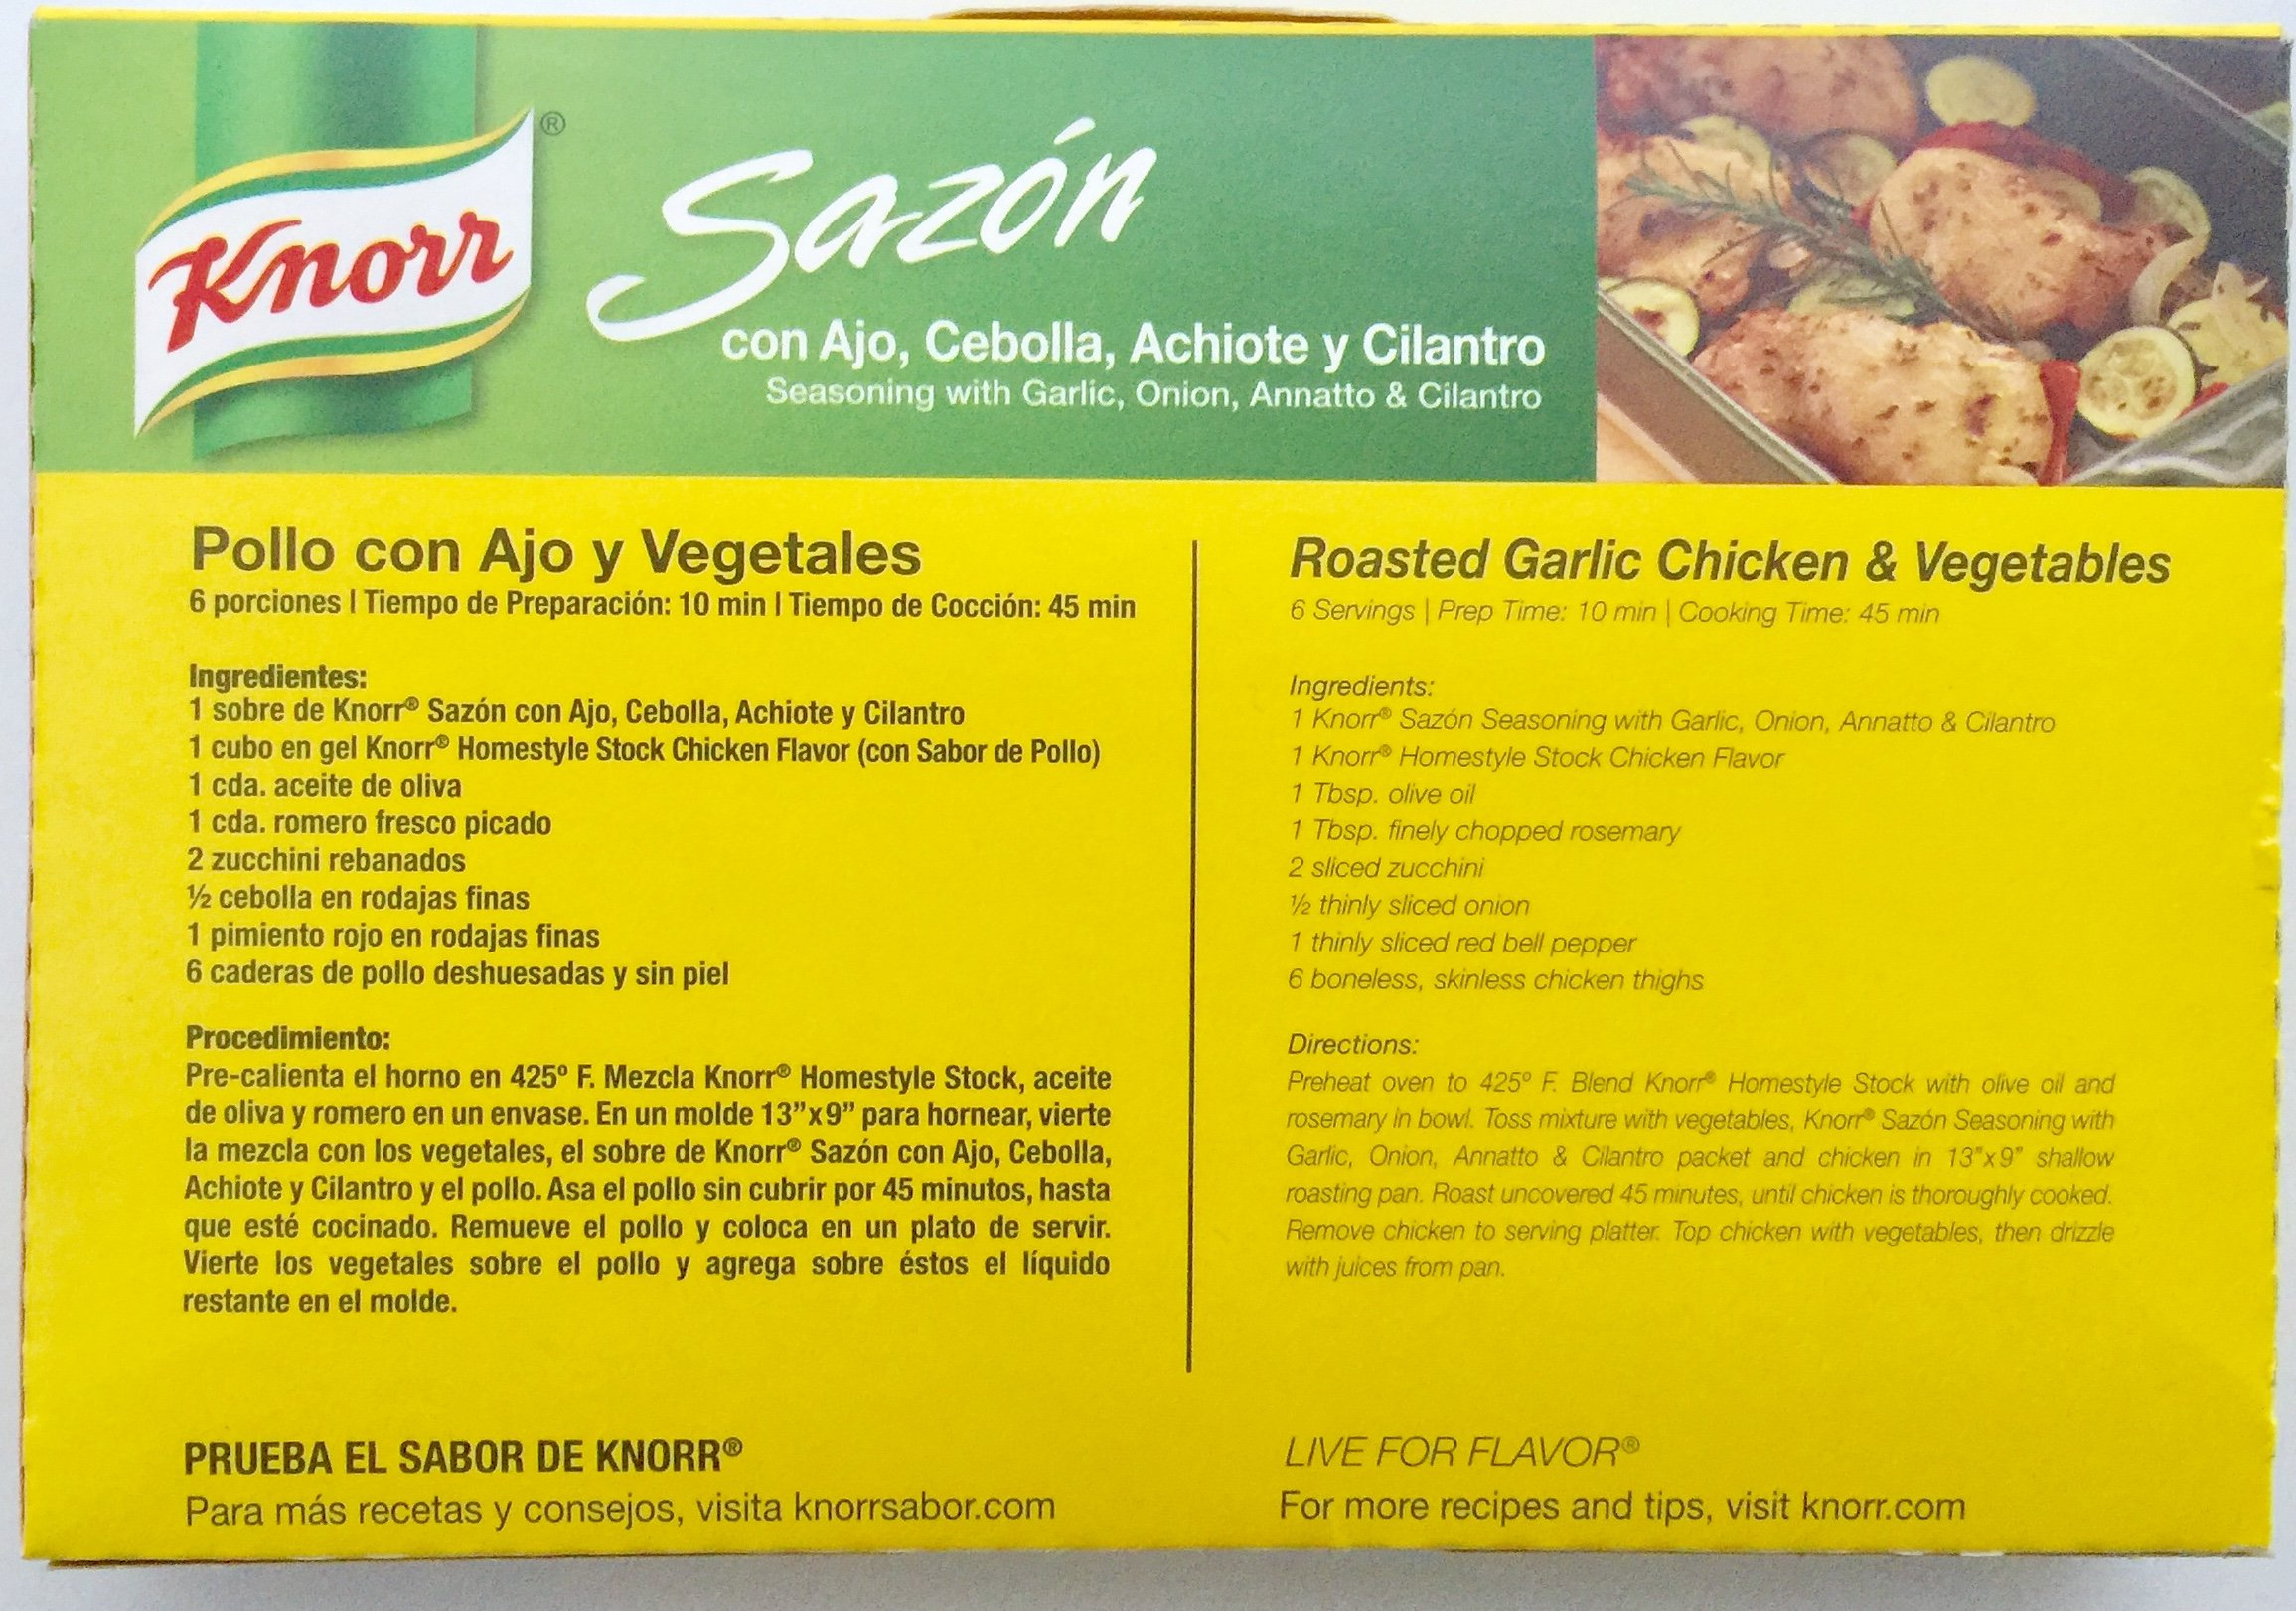 Knorr Sazon Seasoning, Garlic Onion Annatto and Cilantro 2.8 oz, 16 ct